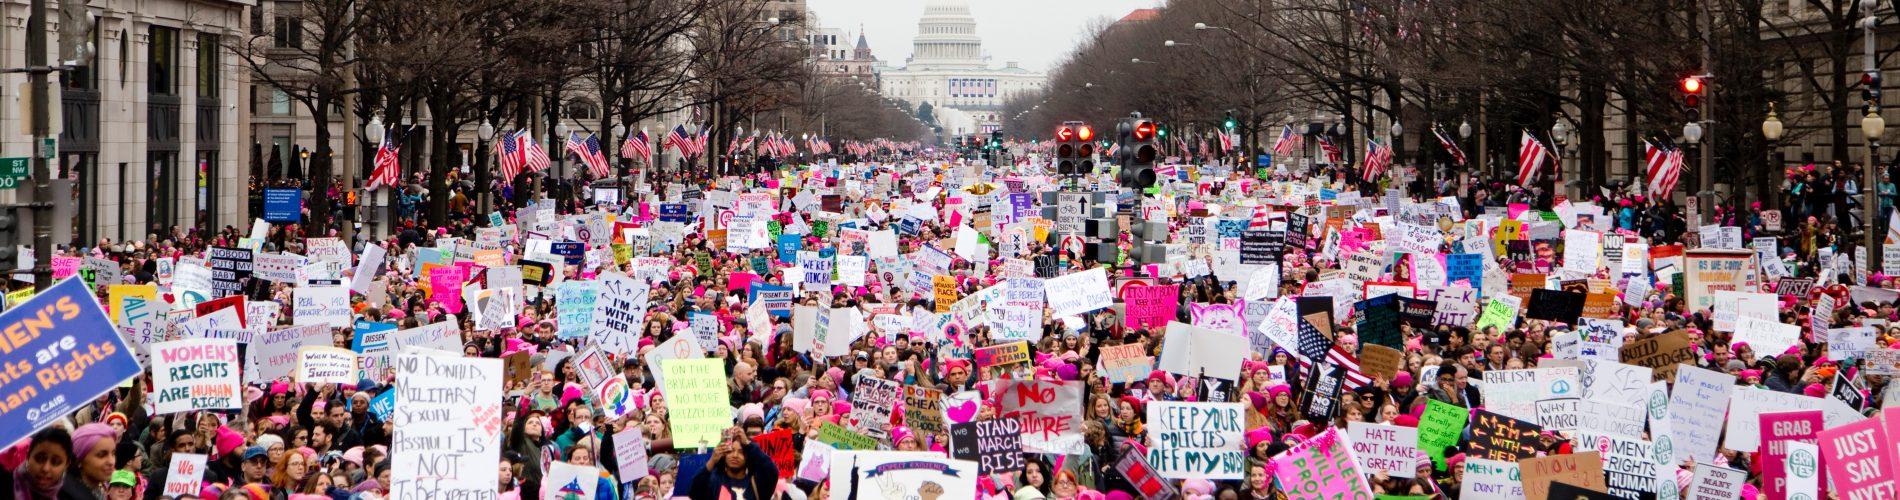 Women's March, global Feminism, Photo by Vlad Tchompalov on Unsplash